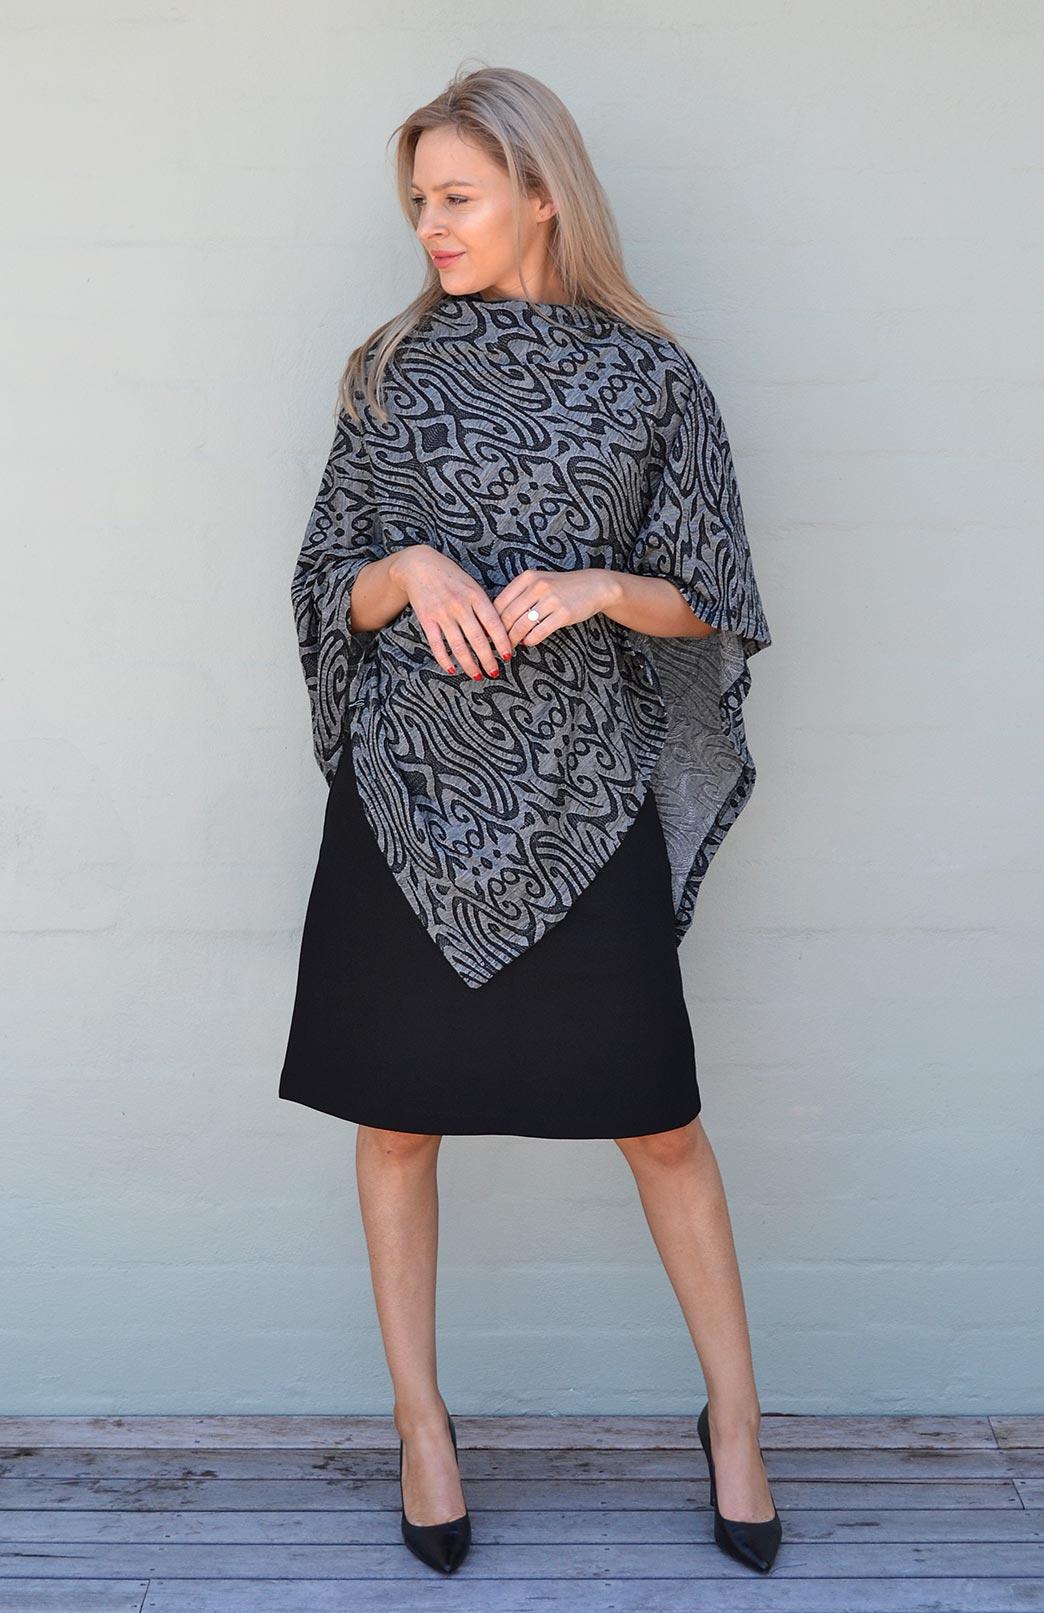 Classic Poncho - Striped & Patterned - Women's Merino Wool Classic Lightweight Poncho - Smitten Merino Tasmania Australia